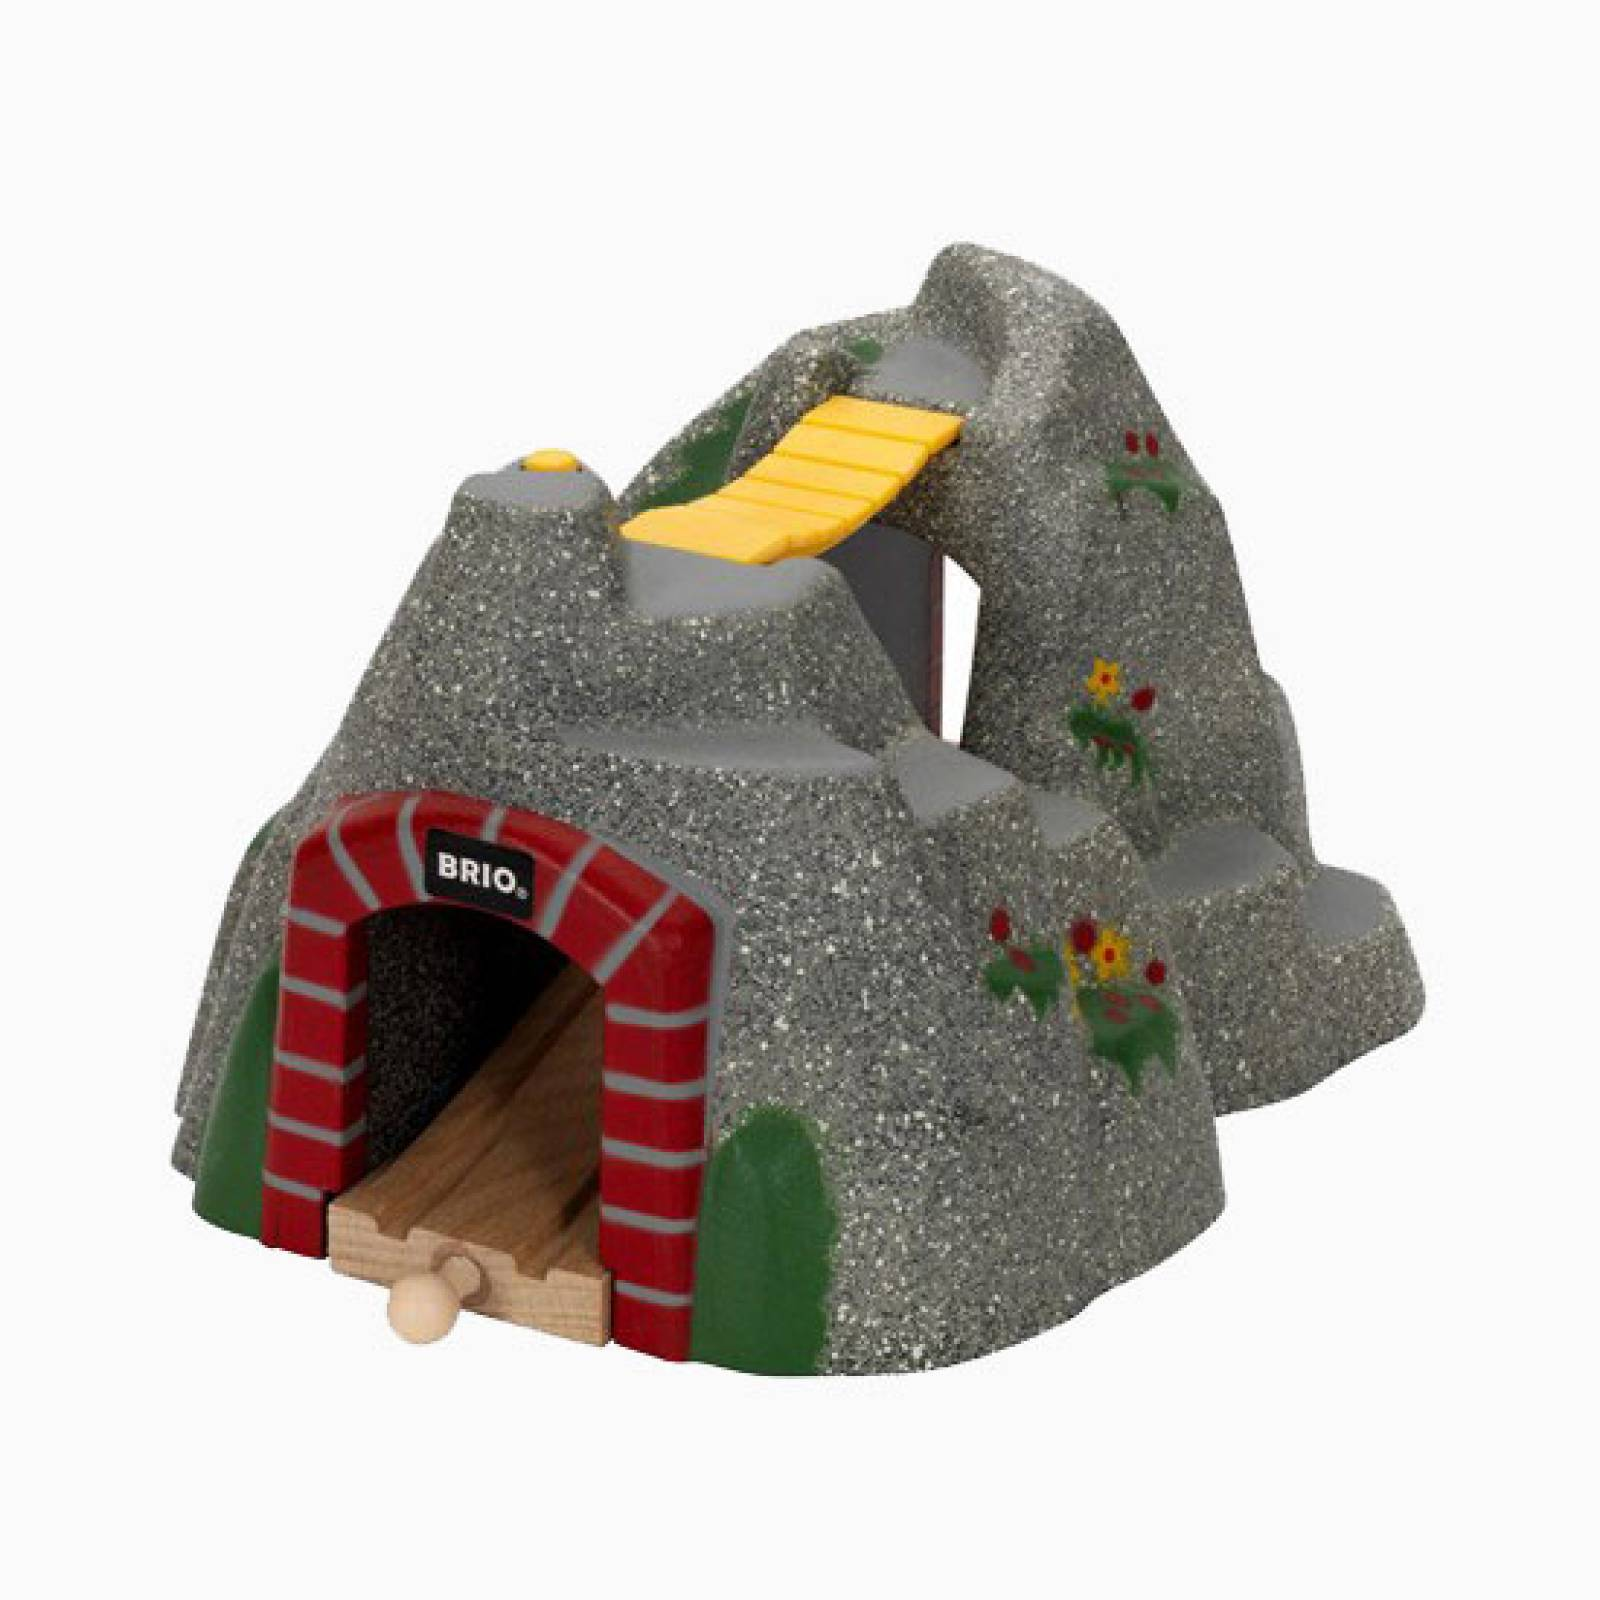 Adventure Tunnel BRIO Wooden Railway Age 3+